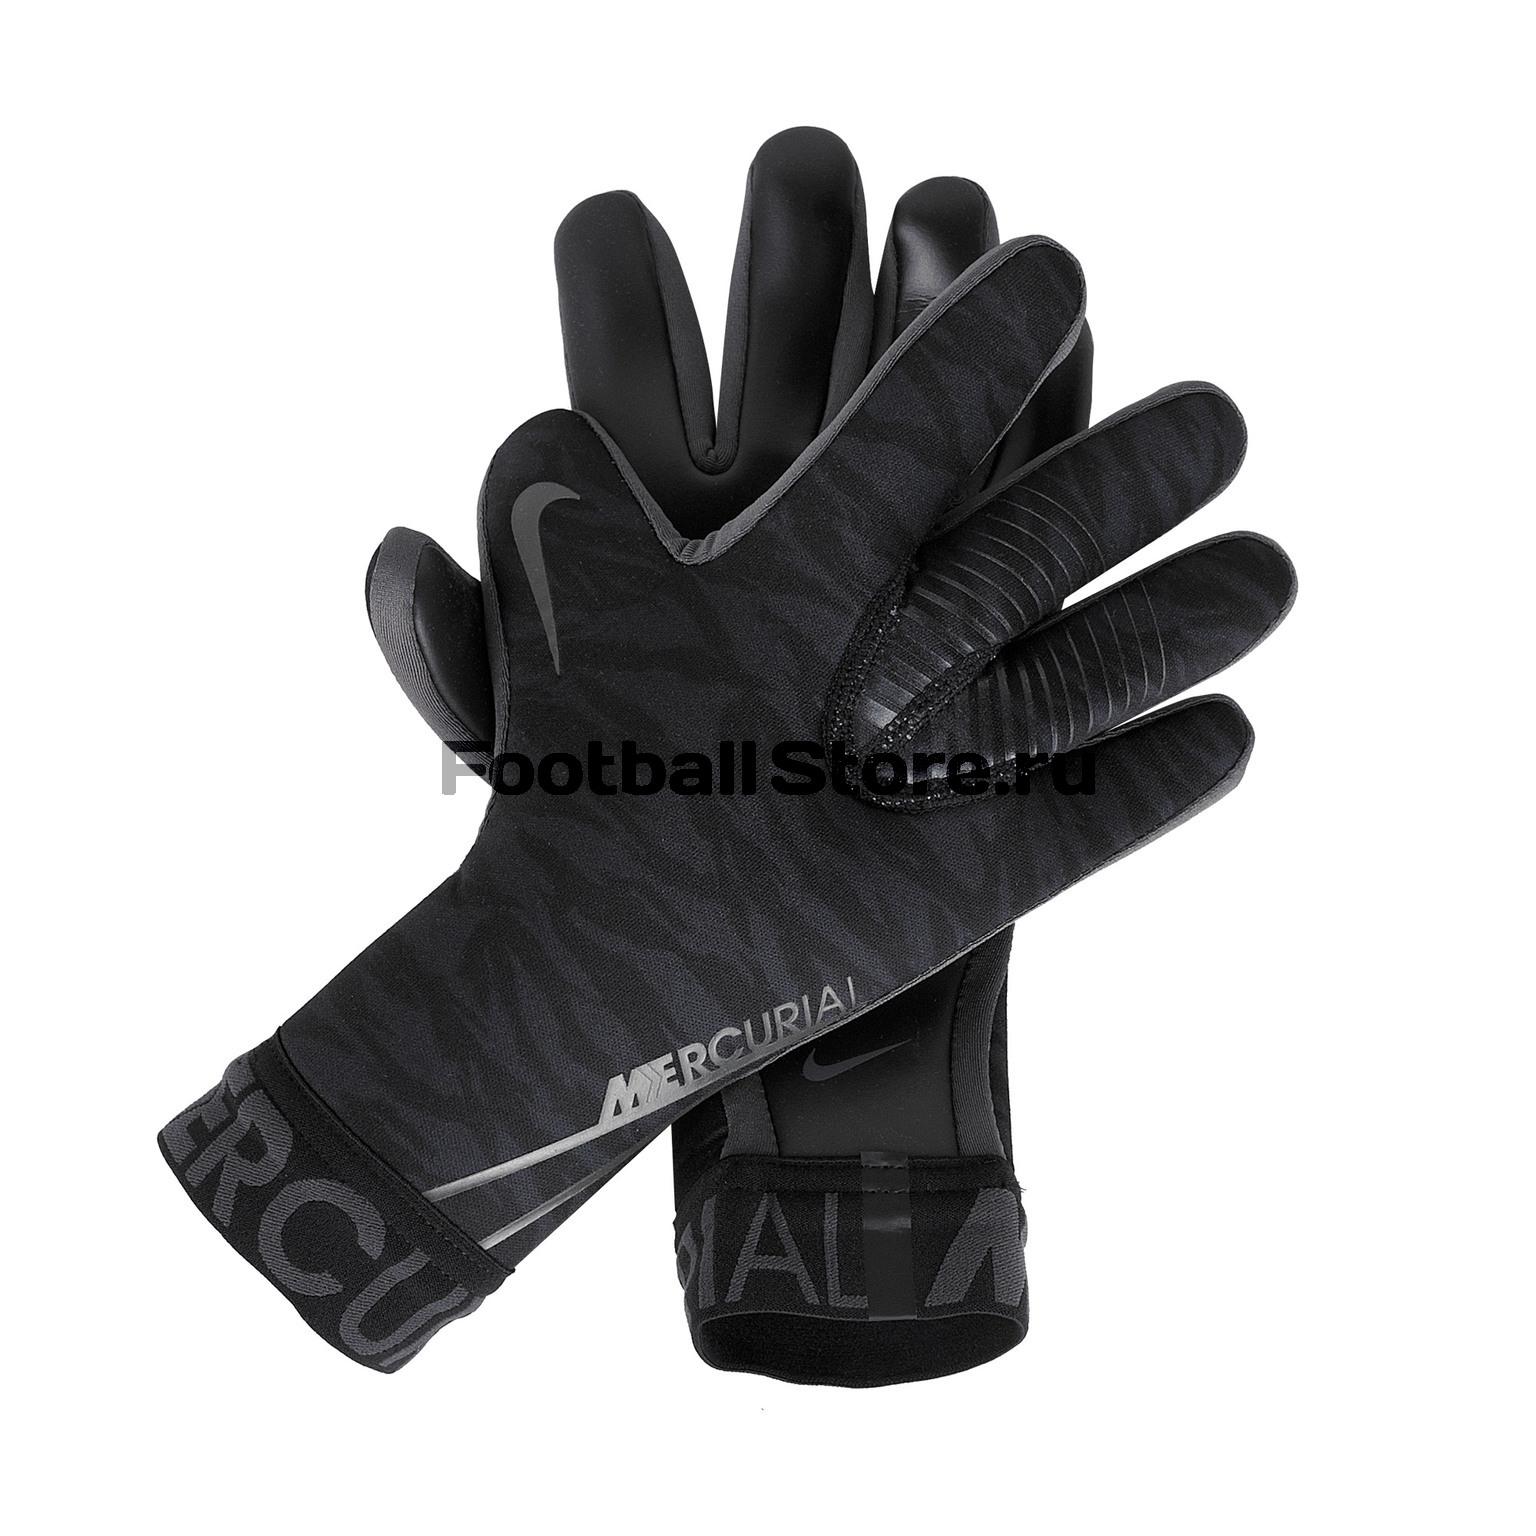 цена Перчатки вратарские Nike Mercurial Touch Victory GS2885-010 в интернет-магазинах